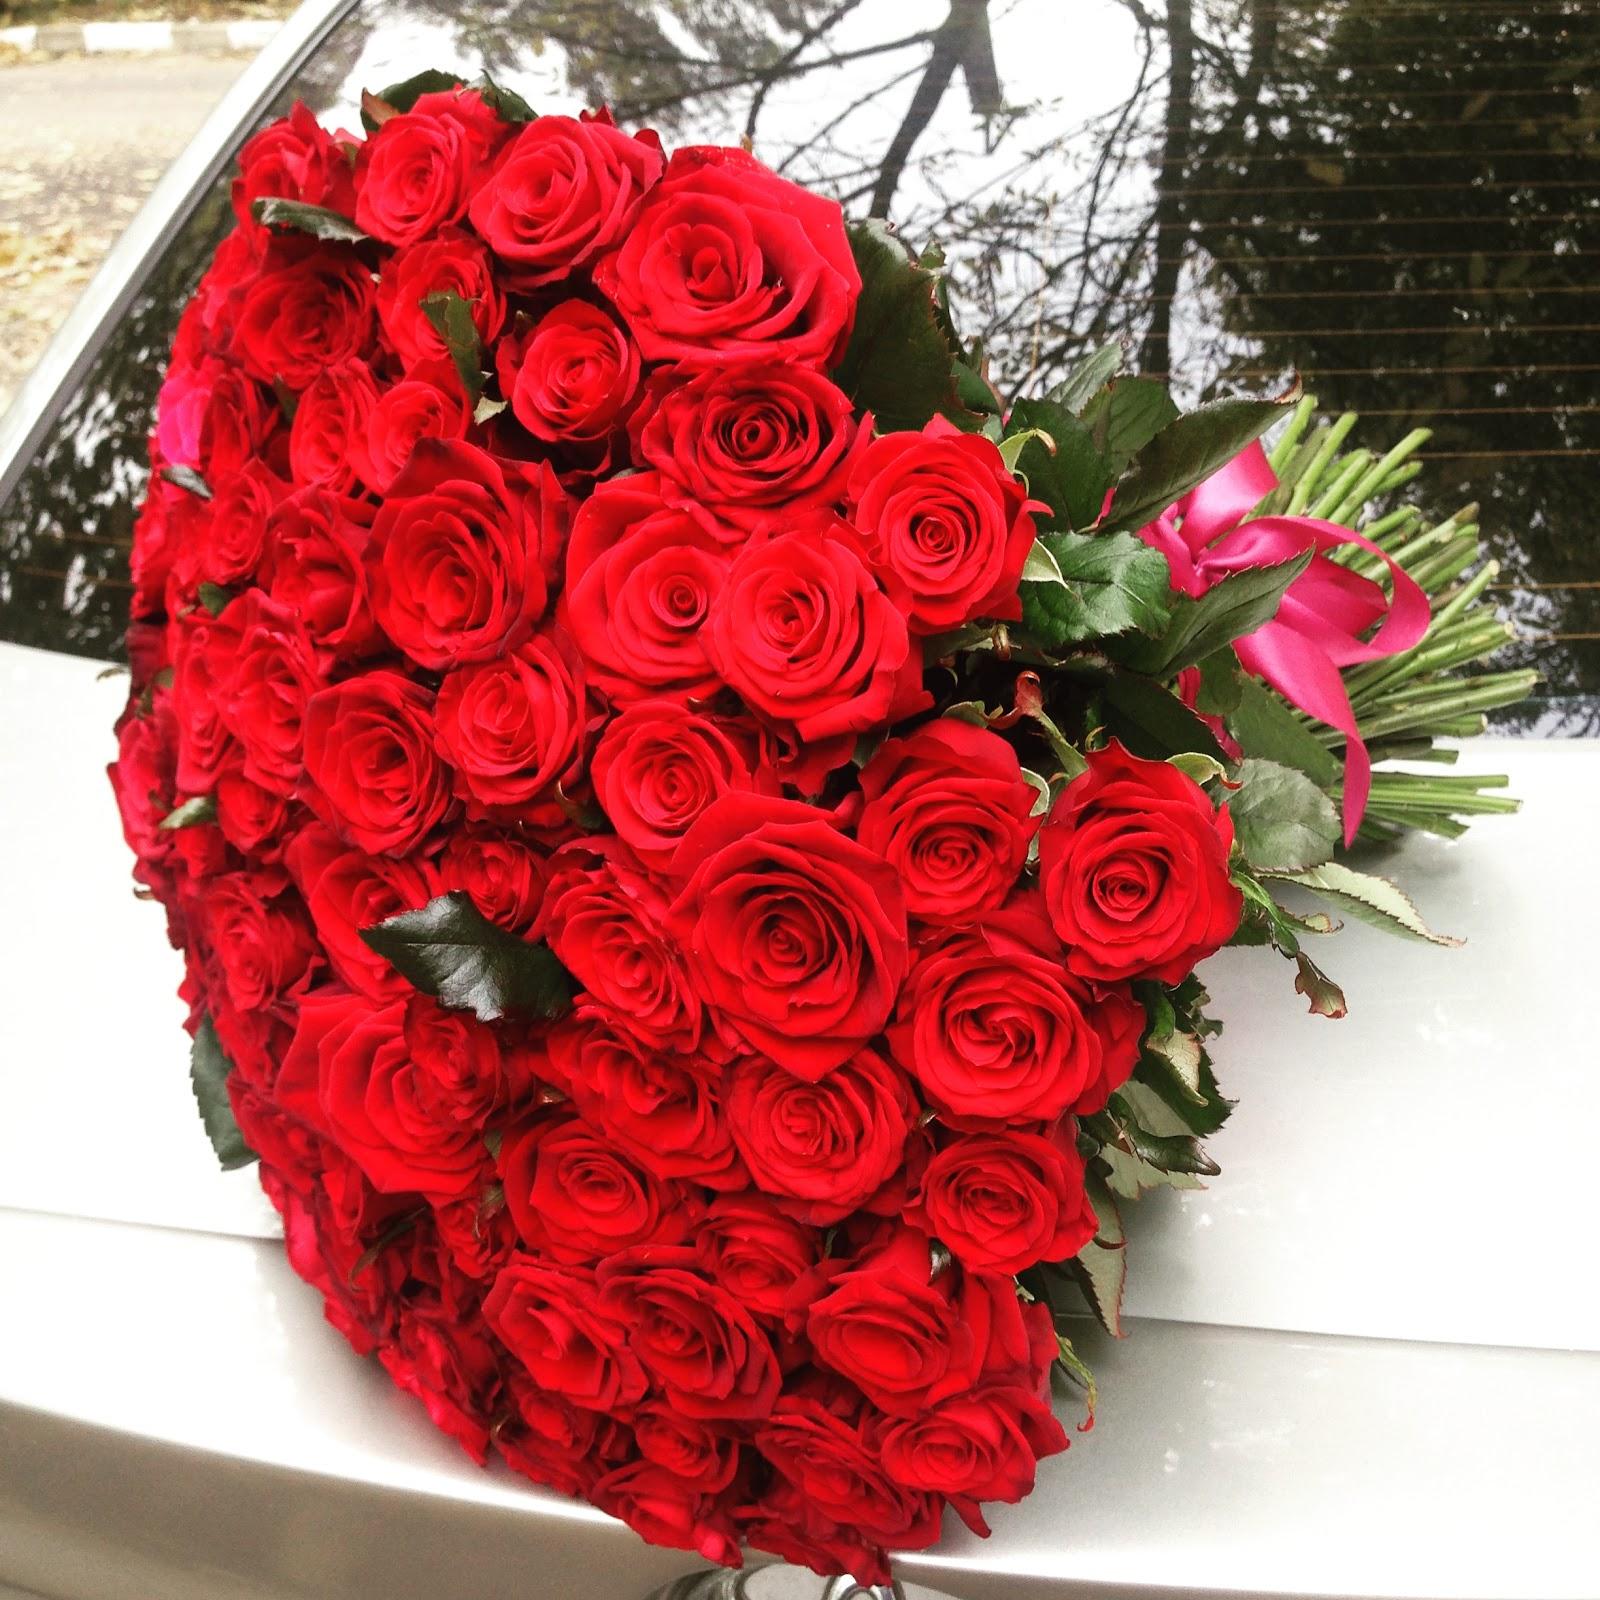 Букет 101 роза красная Престиж 80 см - Роза 21